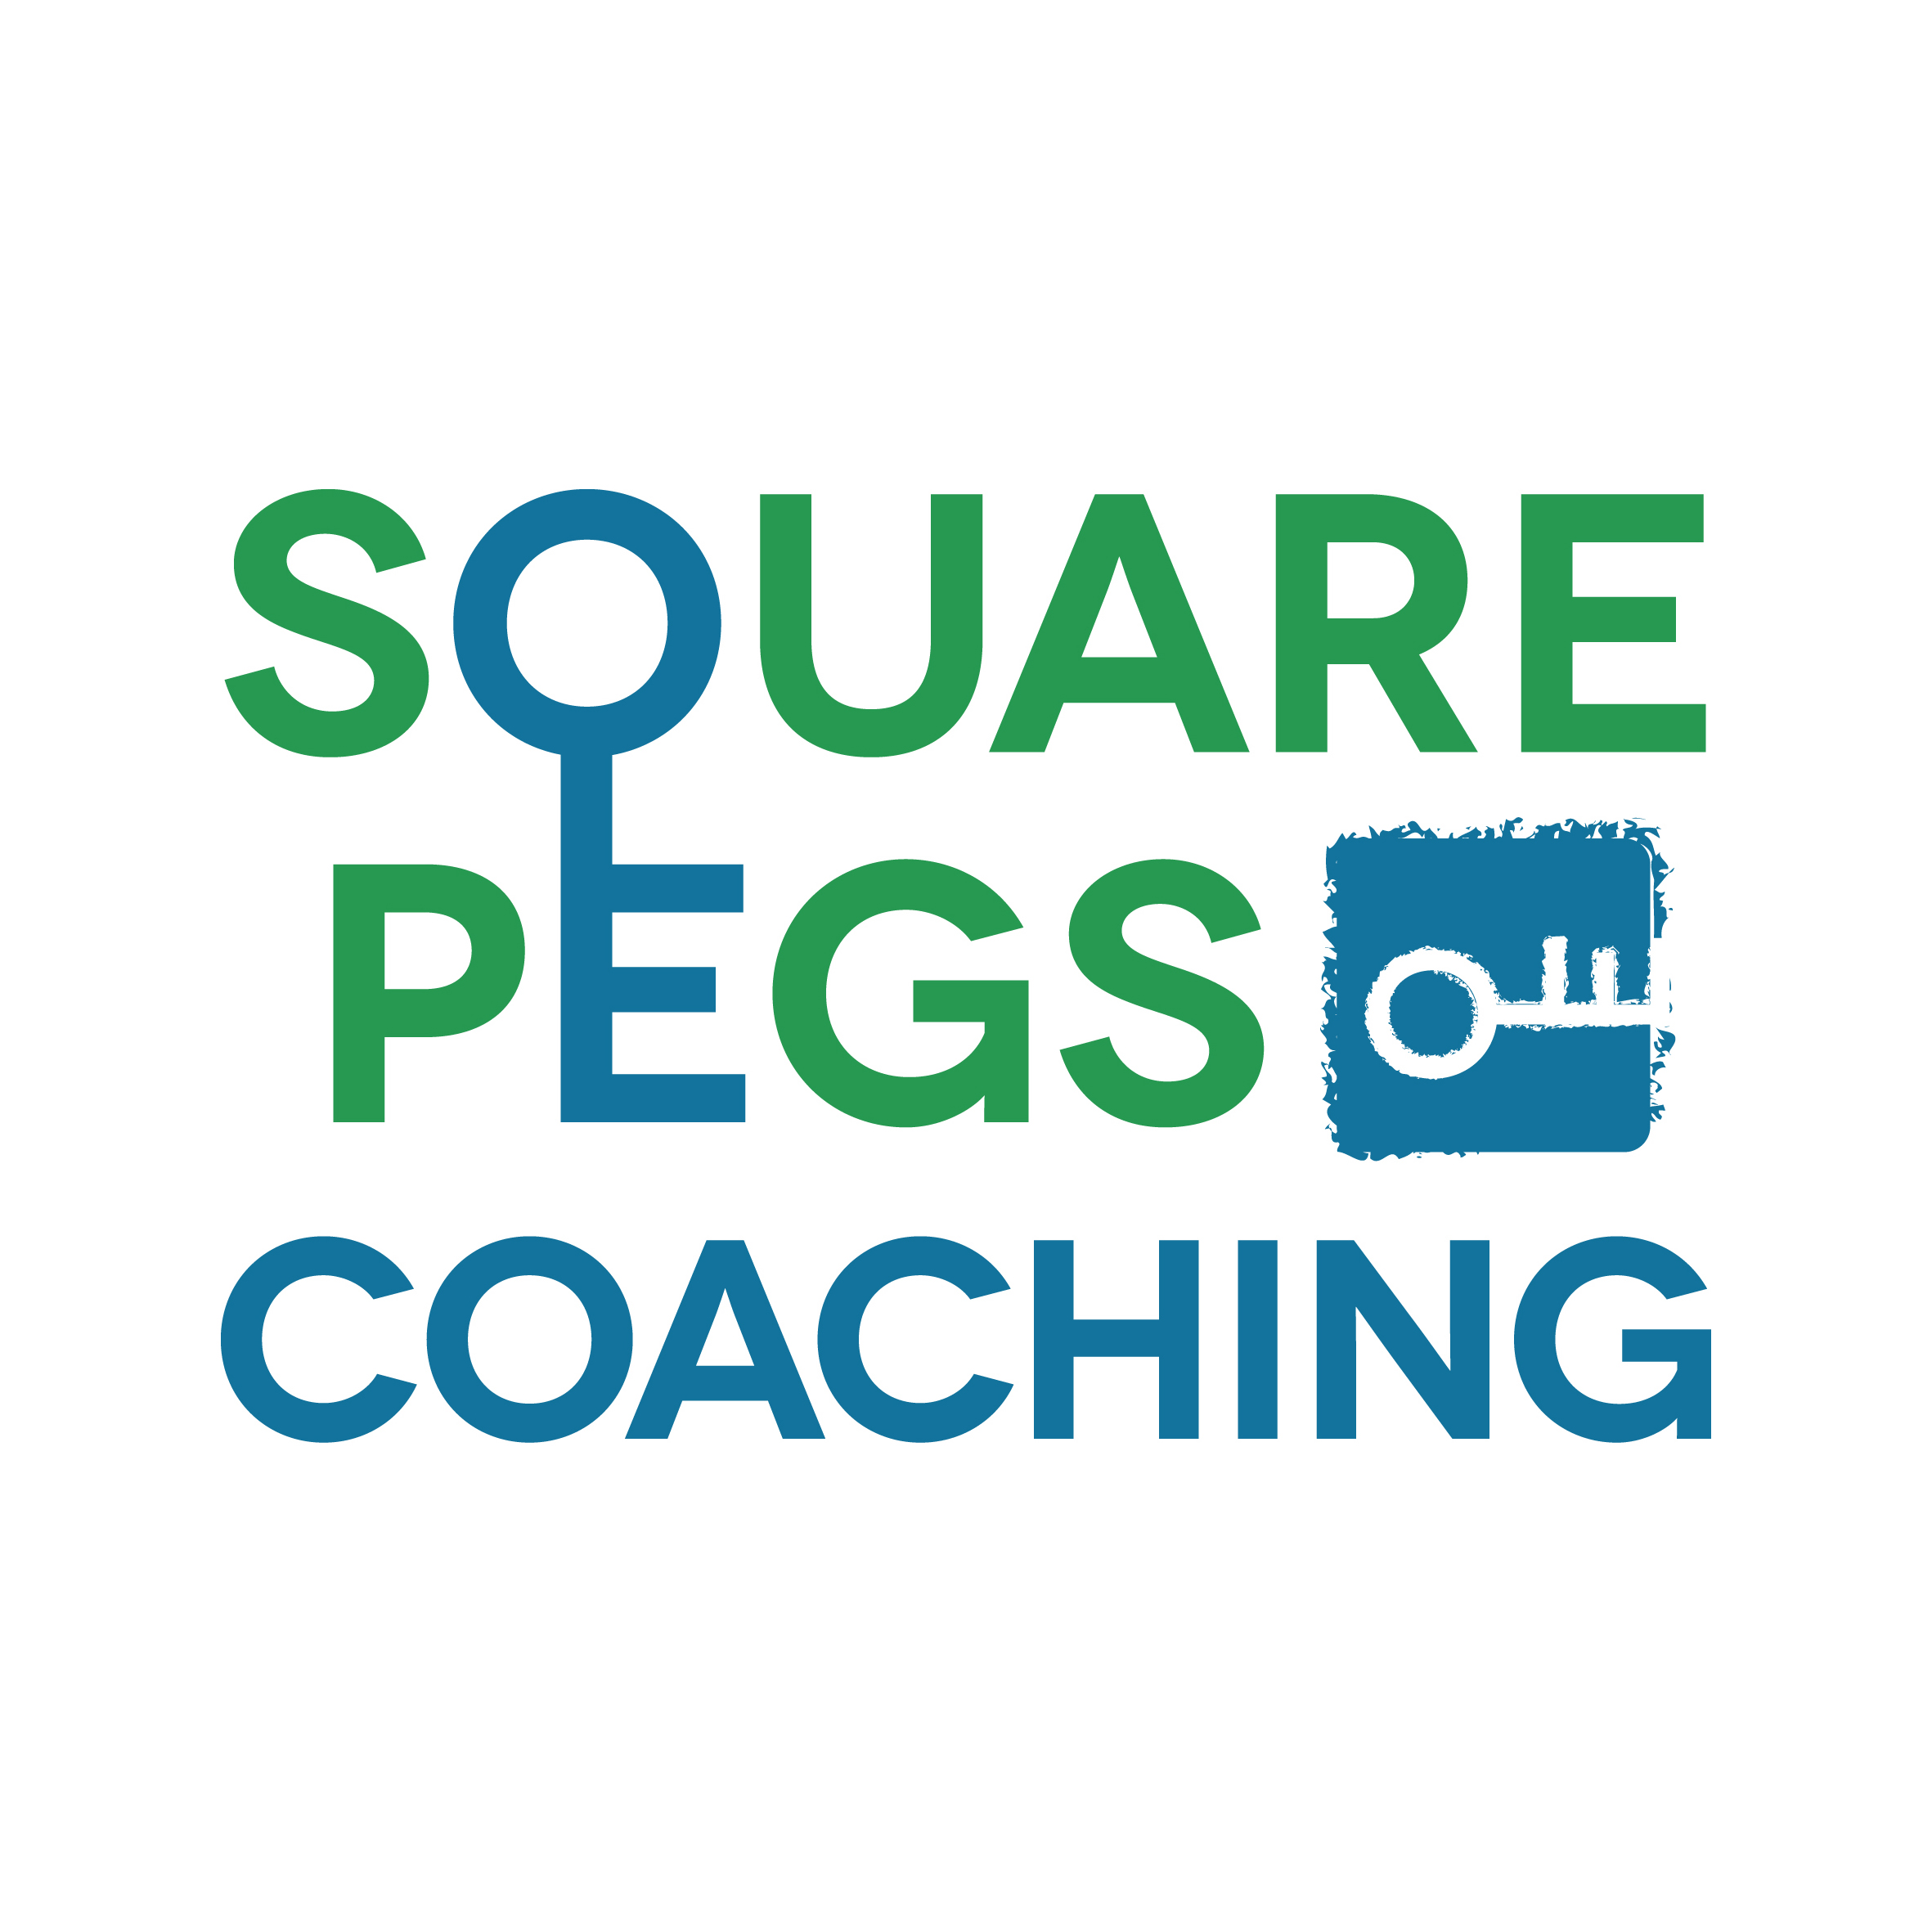 Square Pegs Coaching